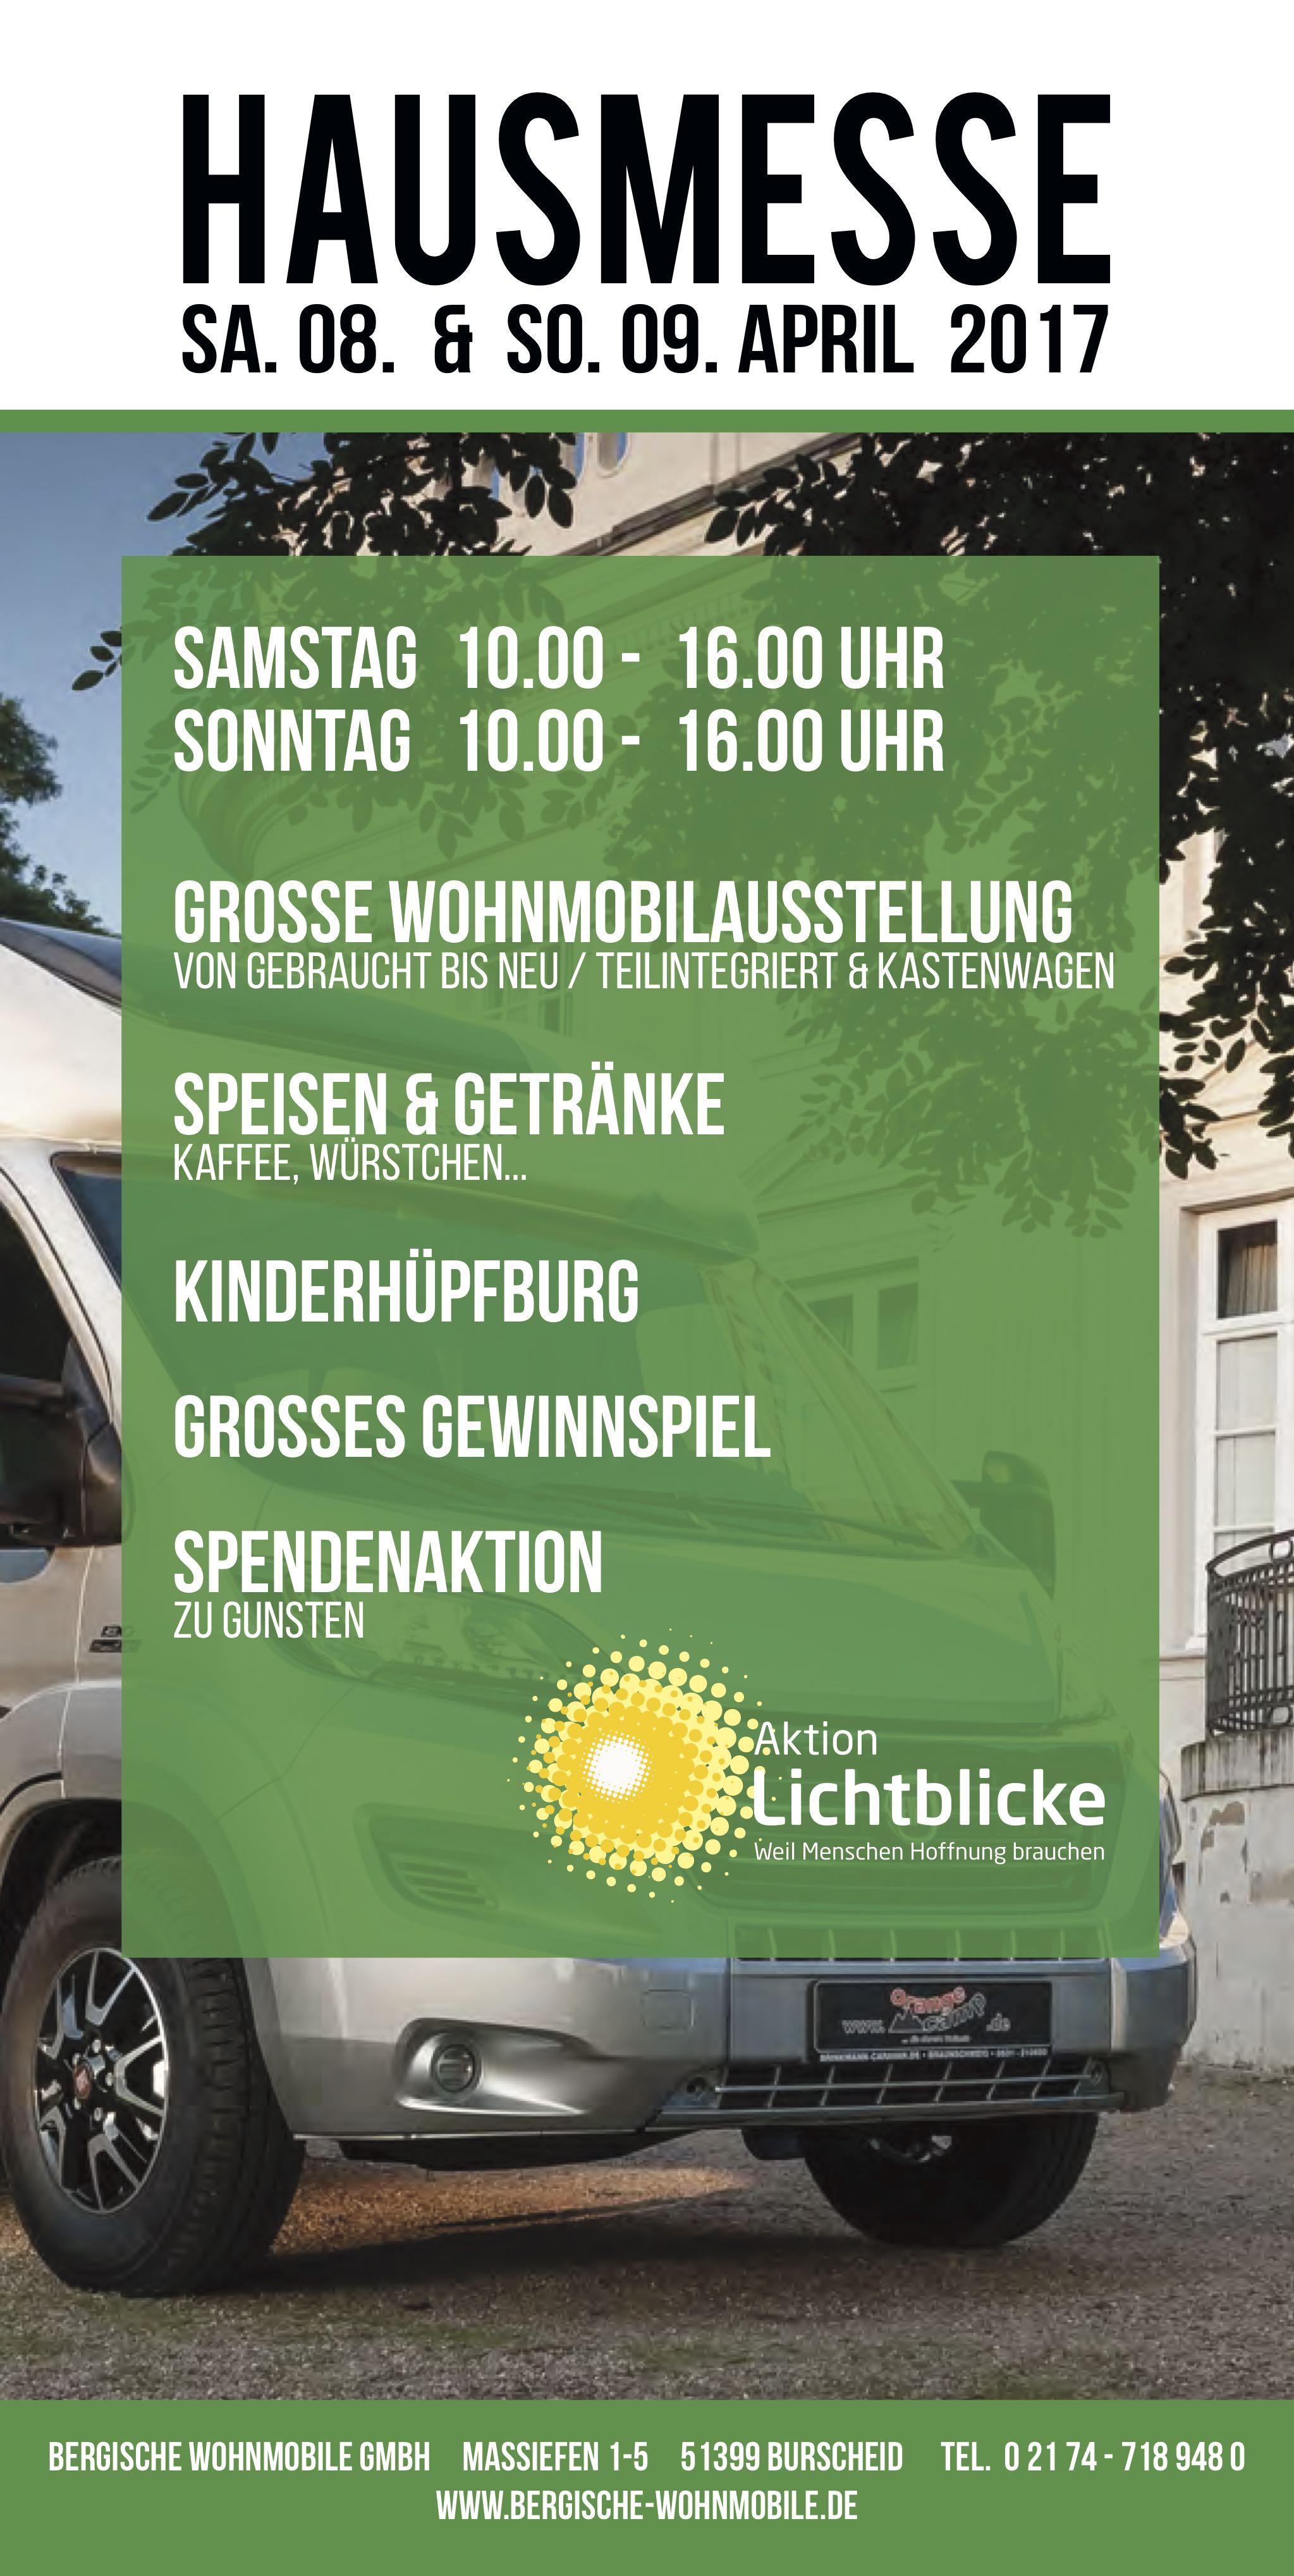 Hausmesse bei Bergische Wohnmobile e.K. in Burscheid